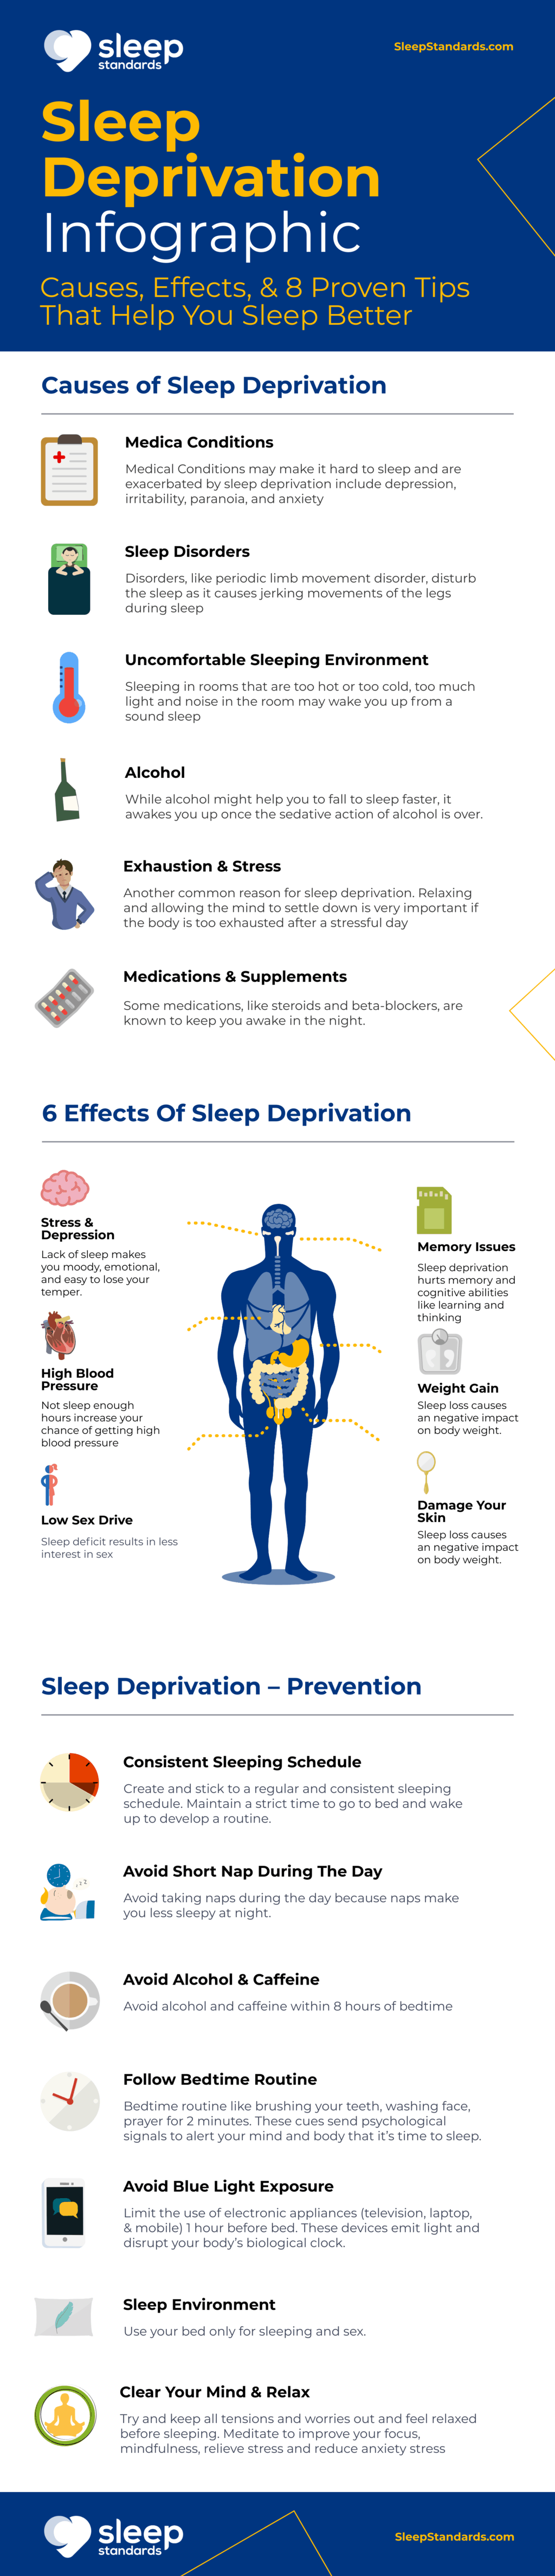 Infographic Sleep Deprivation & Sleep Tips